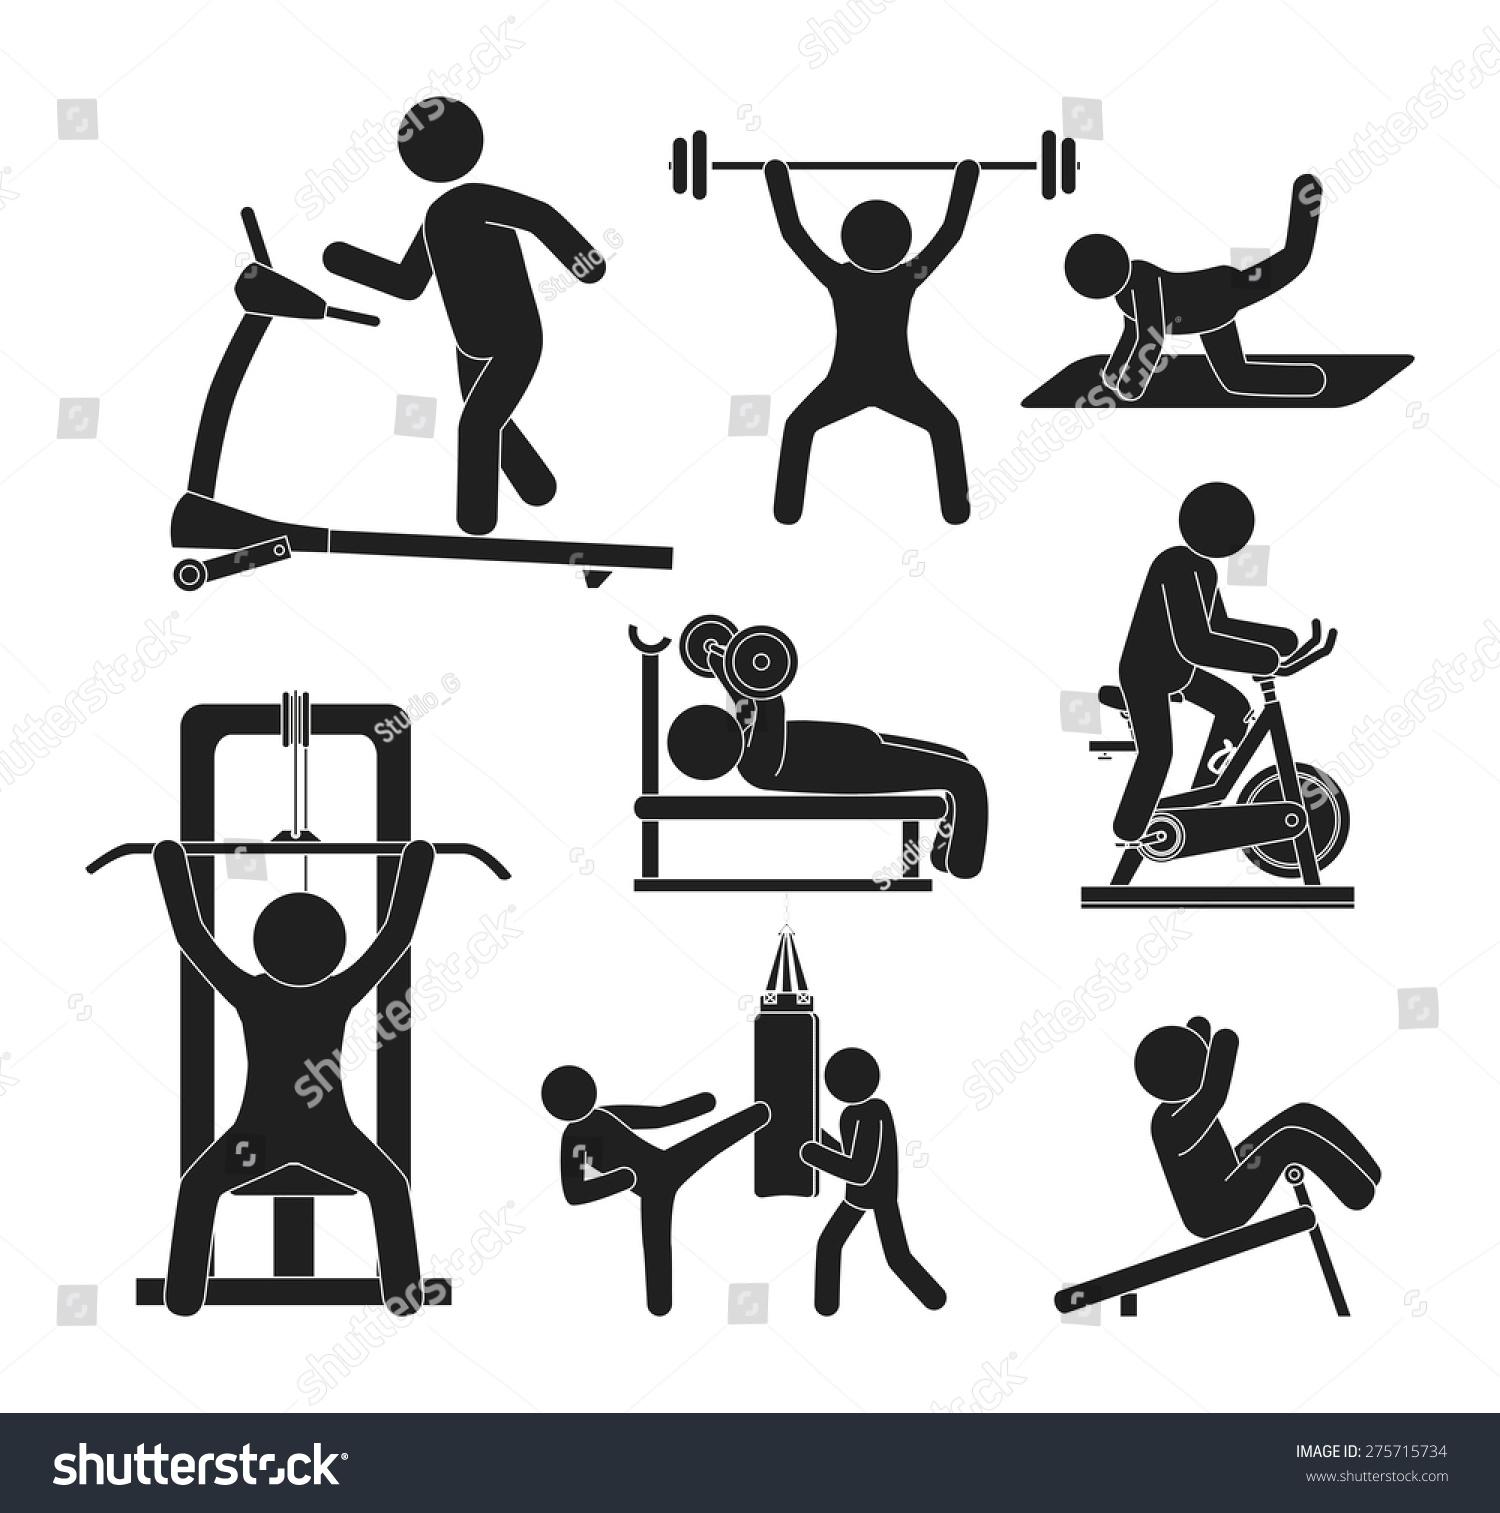 Fitness Design Over White Background Vector Stock Vector 275715734 ... for Physical Fitness Design  186ref